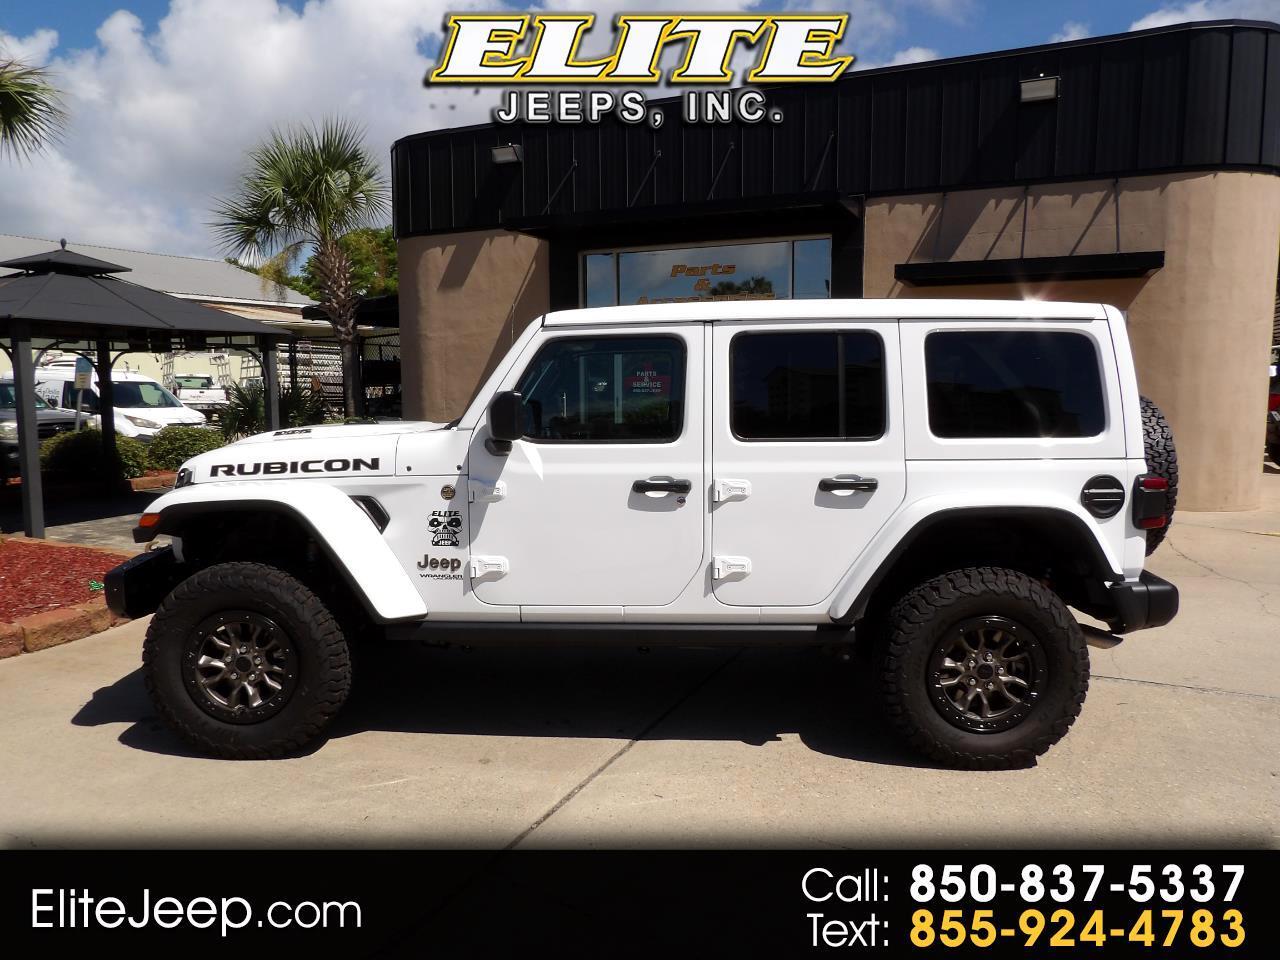 Jeep Wrangler Unlimited Rubicon 392 4x4 2021